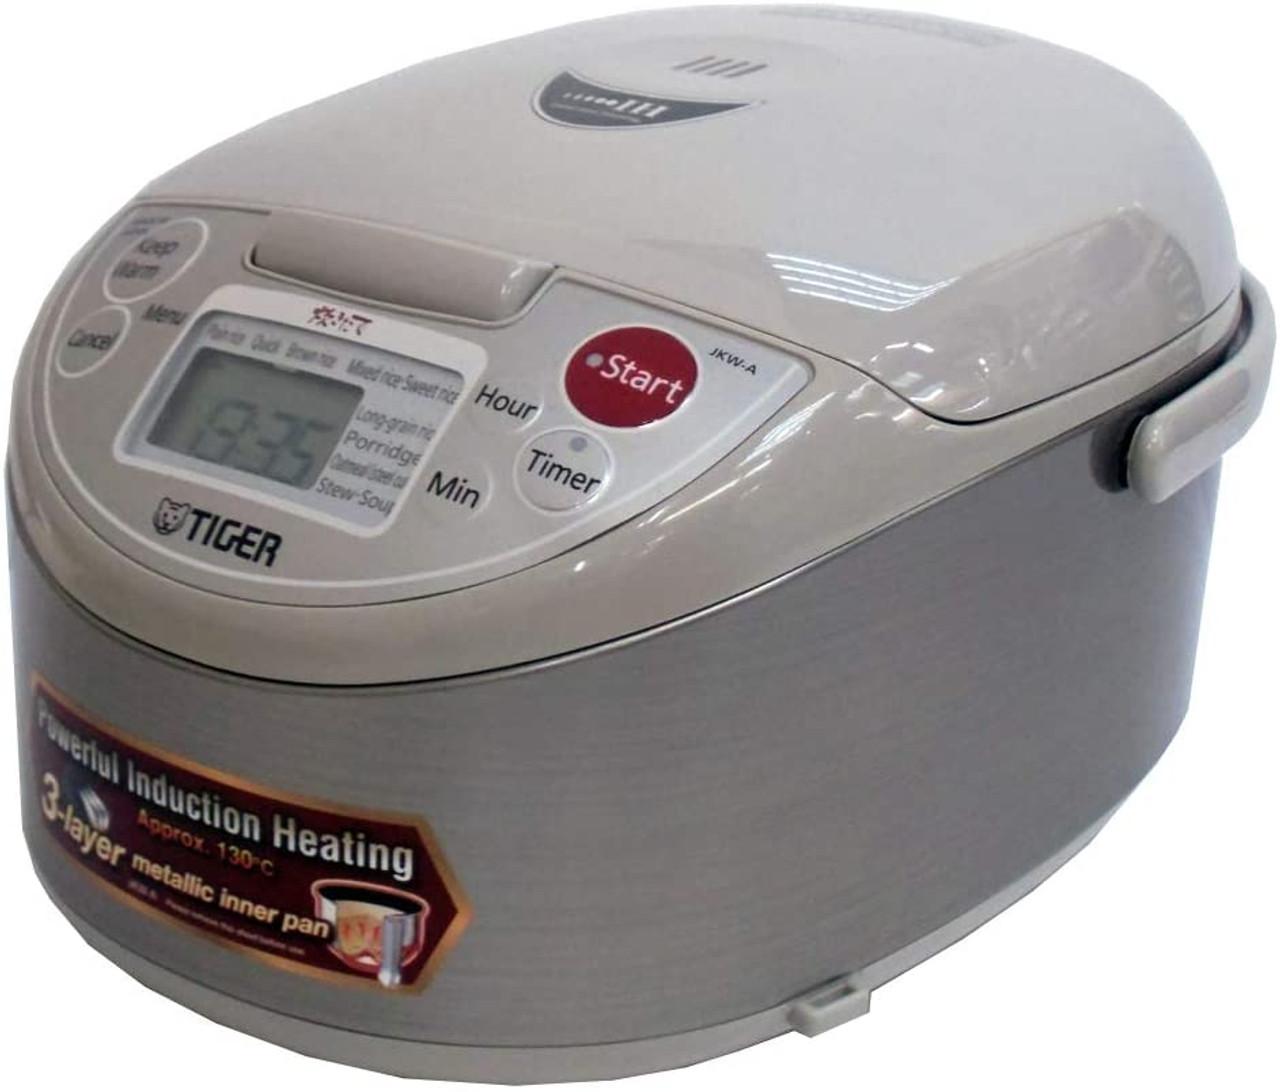 Tiger IH Rice Cooker 220v 1.0L (5.5 Cups) JKW-A10W